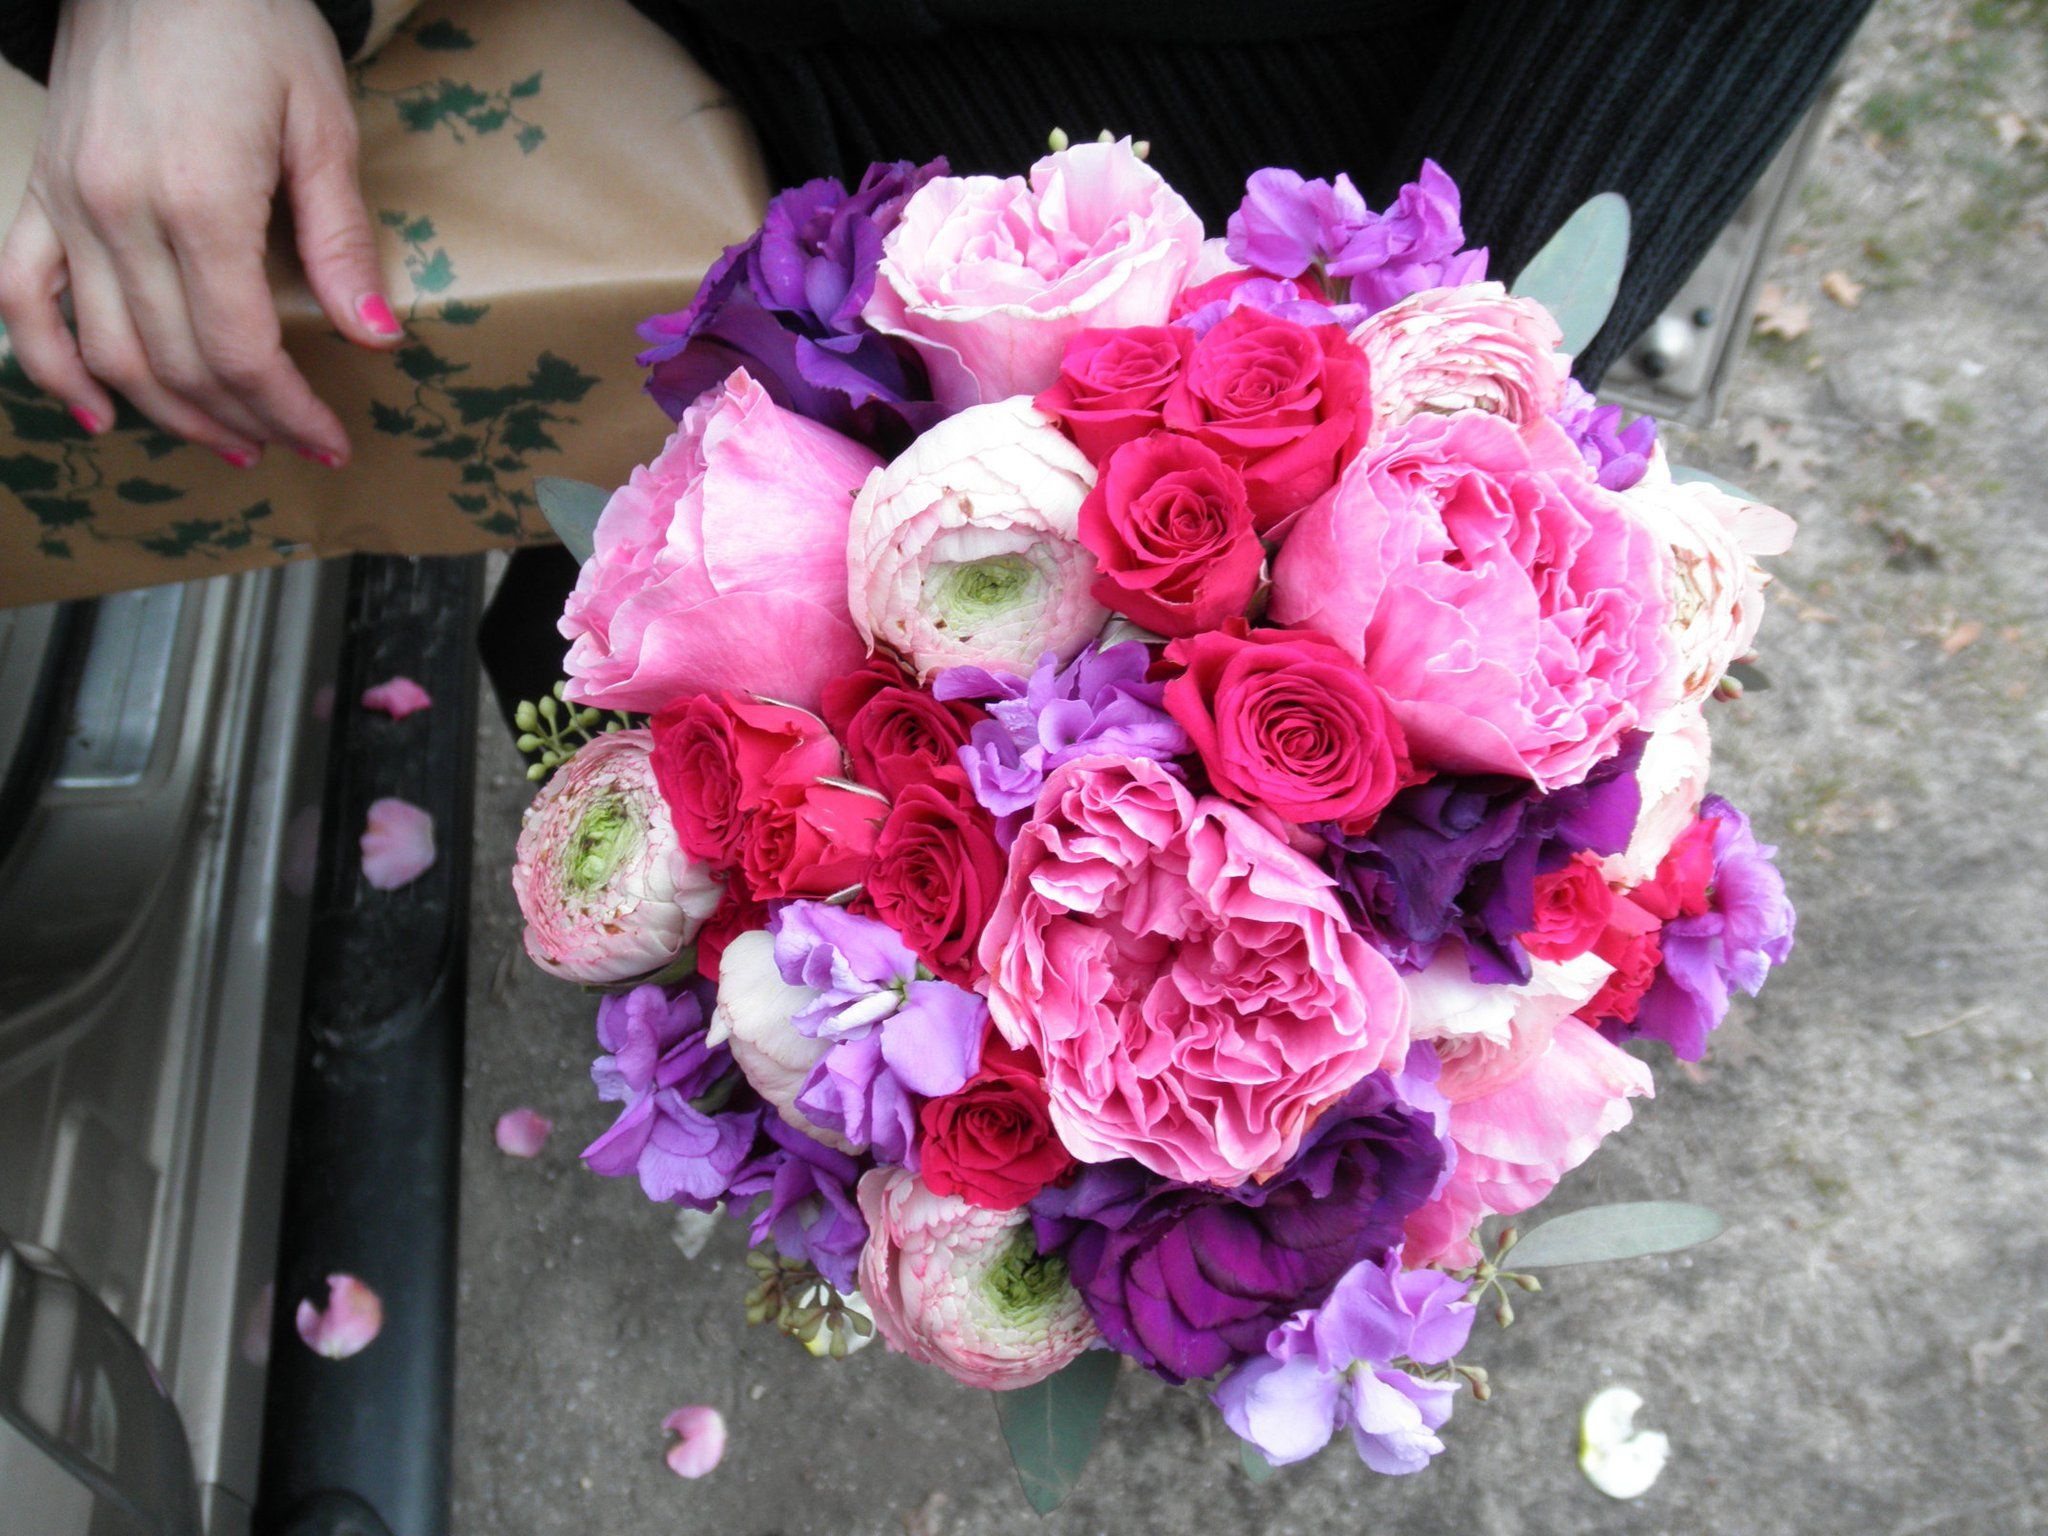 Hot Pink Spray Roses, Pink Garden Roses, Pink Ranunculus